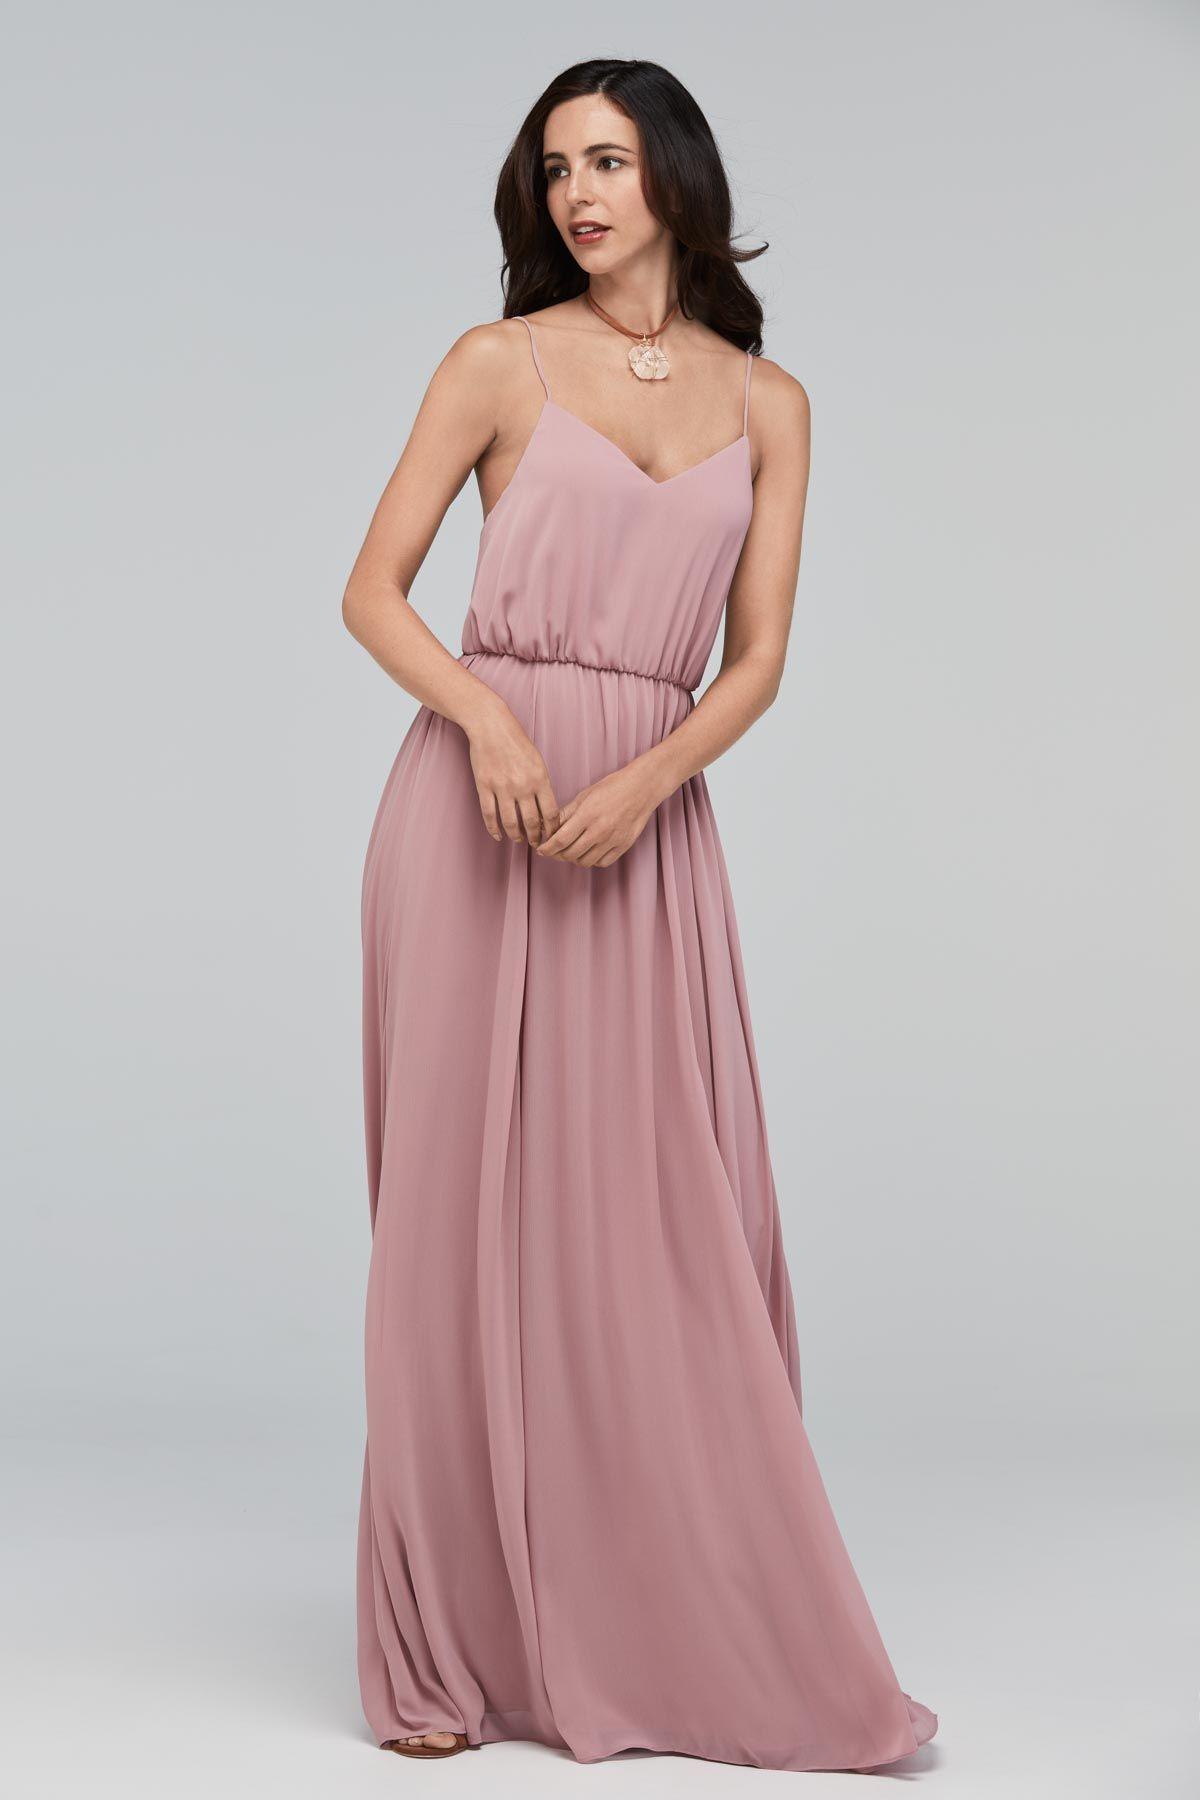 Kerstie 3504 | Watters Bridesmaids | Watters | moda | Pinterest ...